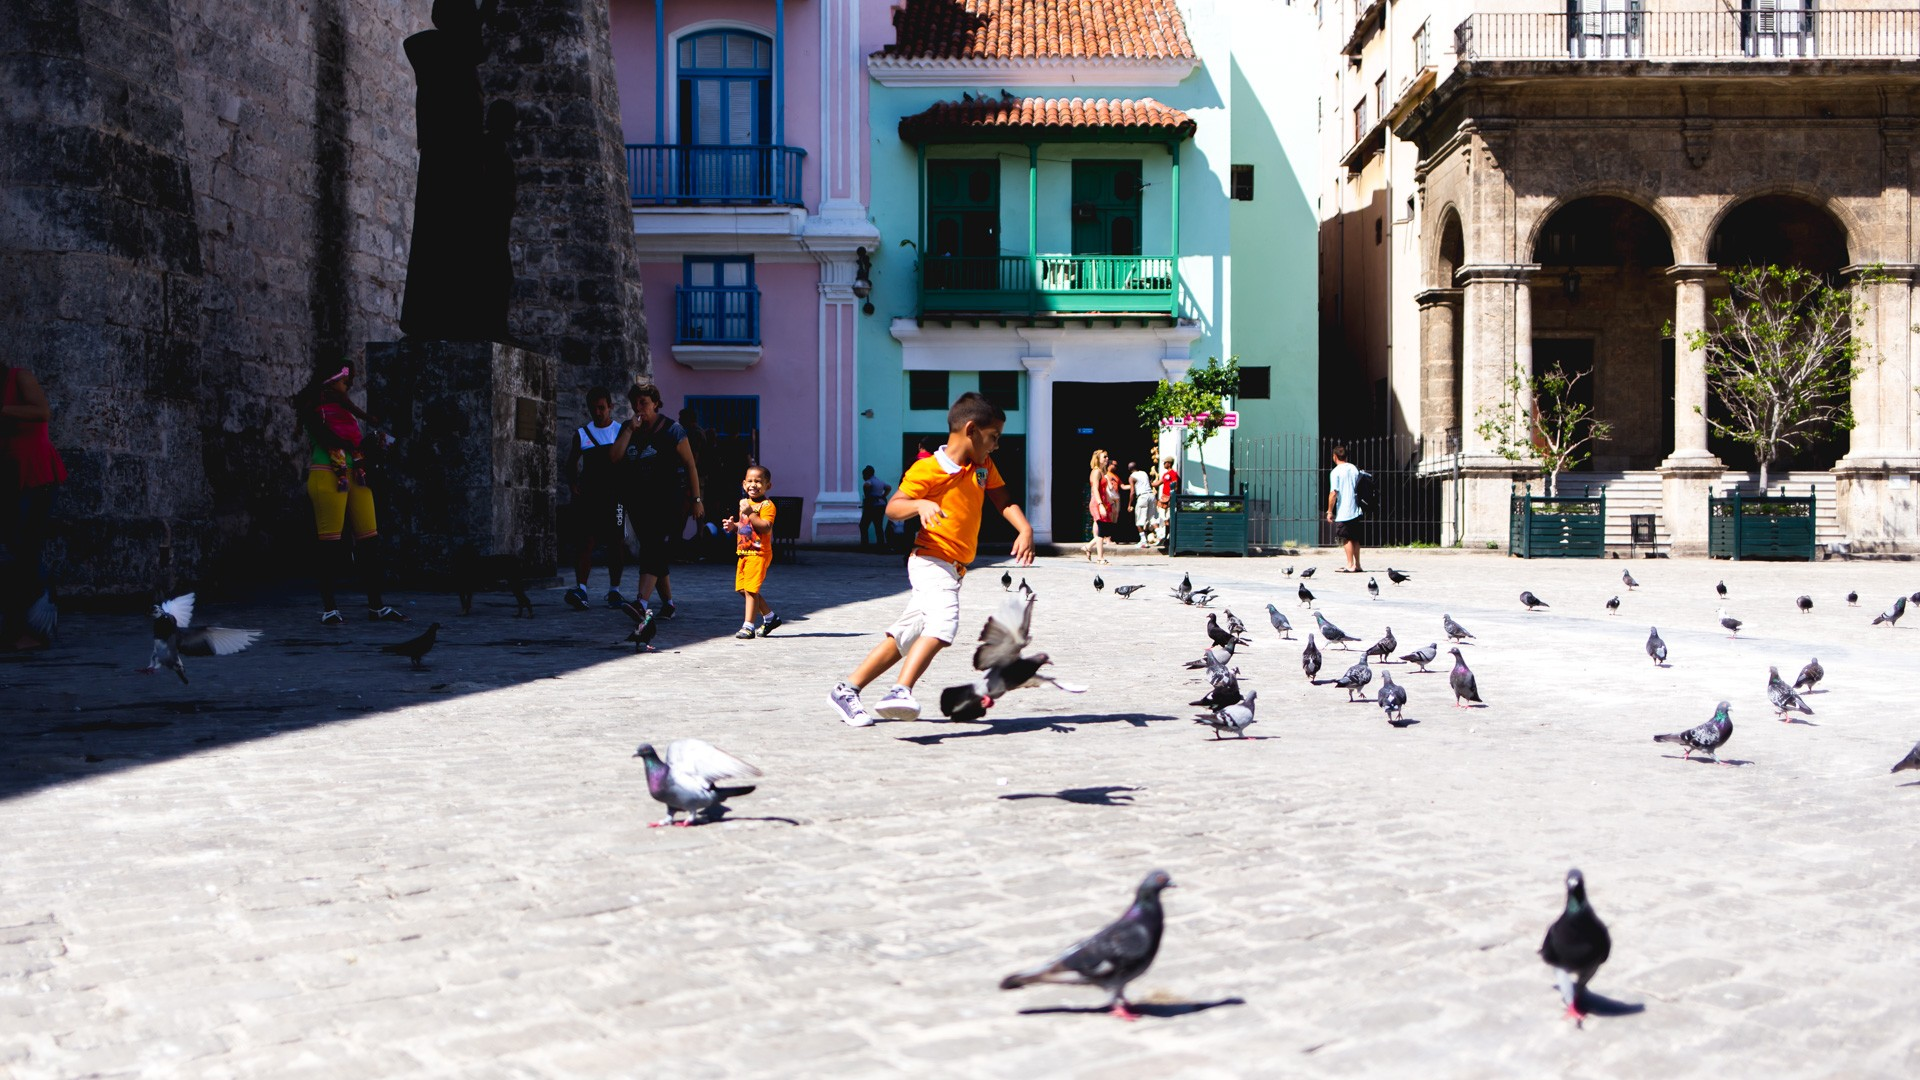 Damien-Dohmen-Photographe-Cuba-4